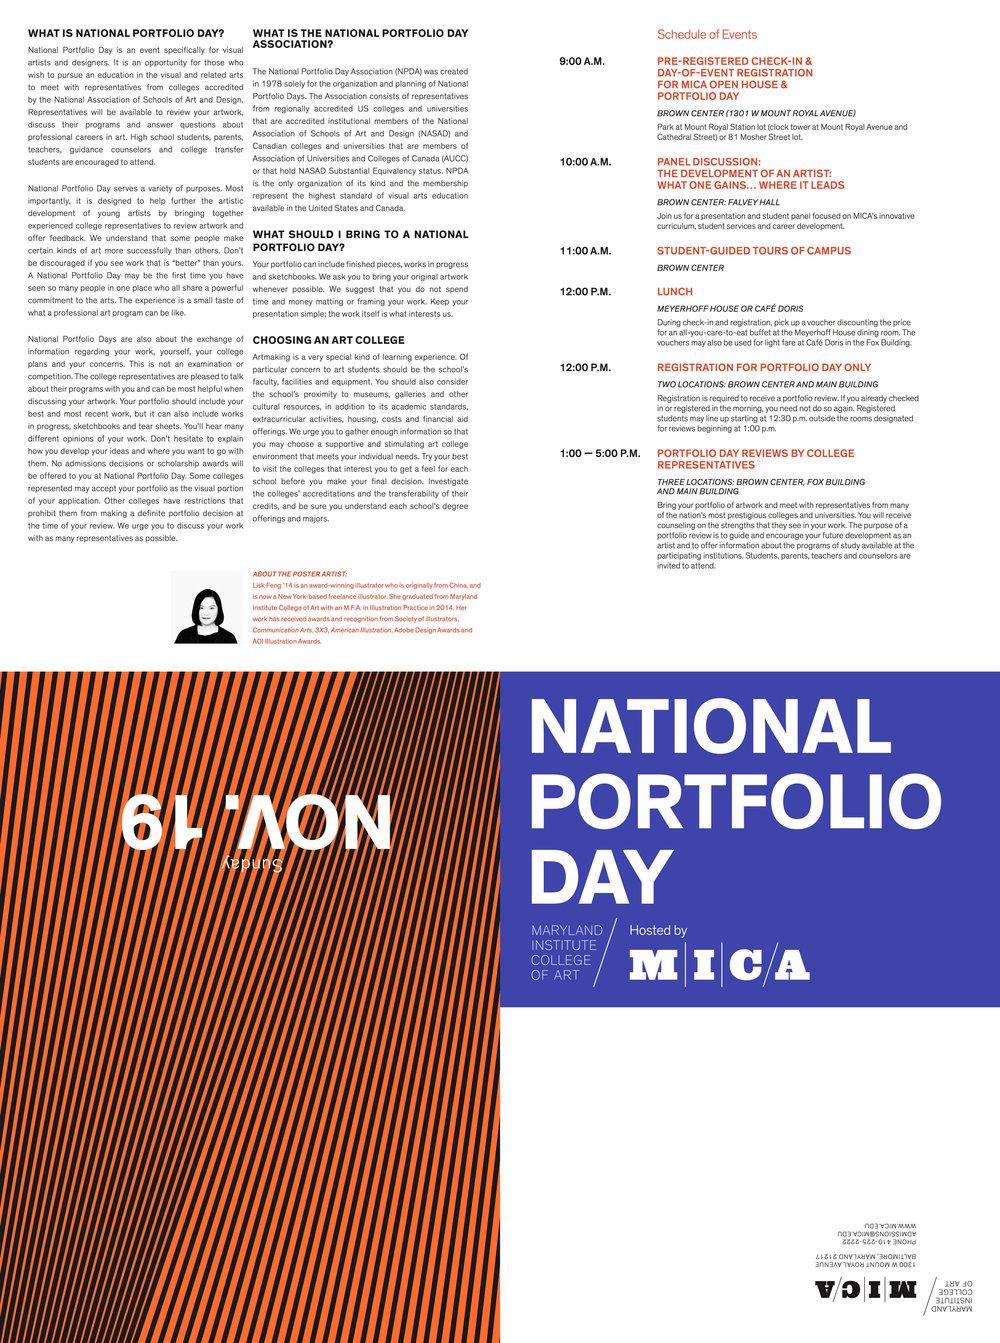 2017_PortfolioDay_Poster3-(1)2sss.jpg